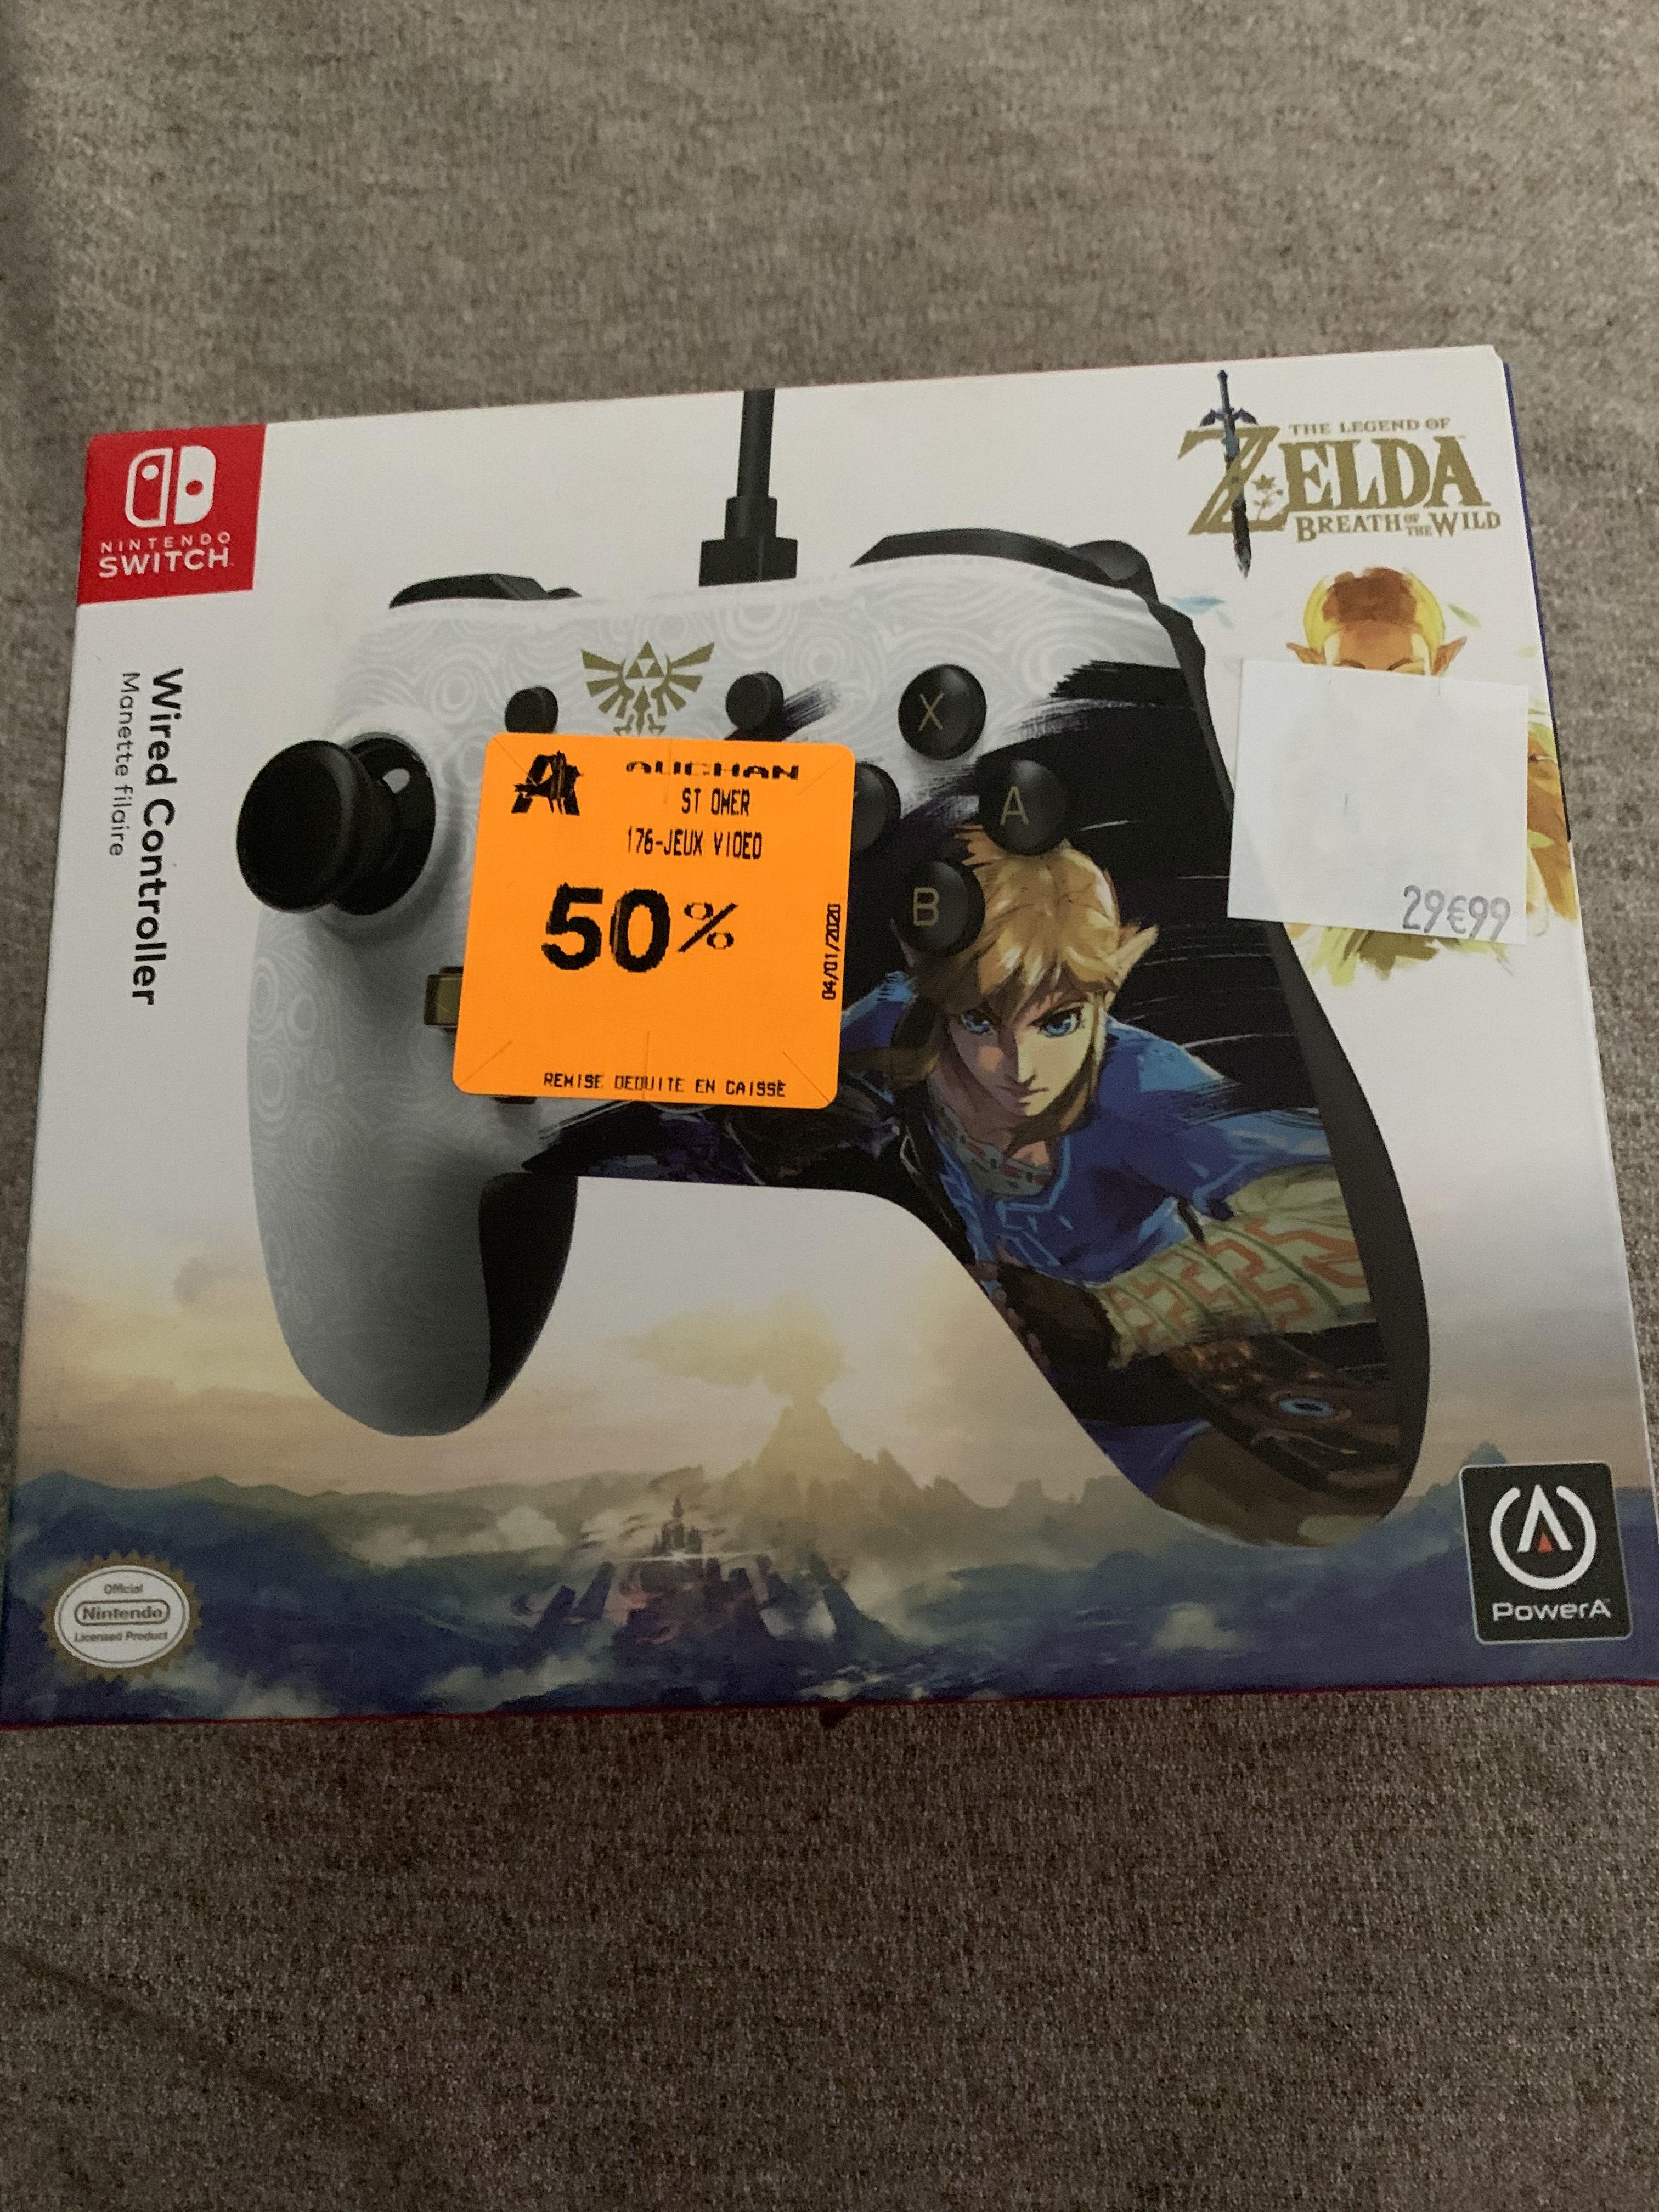 Joypad filaire pour Nintendo Switch : Zelda: Breath of the Wild Edition - PowerA (Longuenesse / Saint Omer 62)